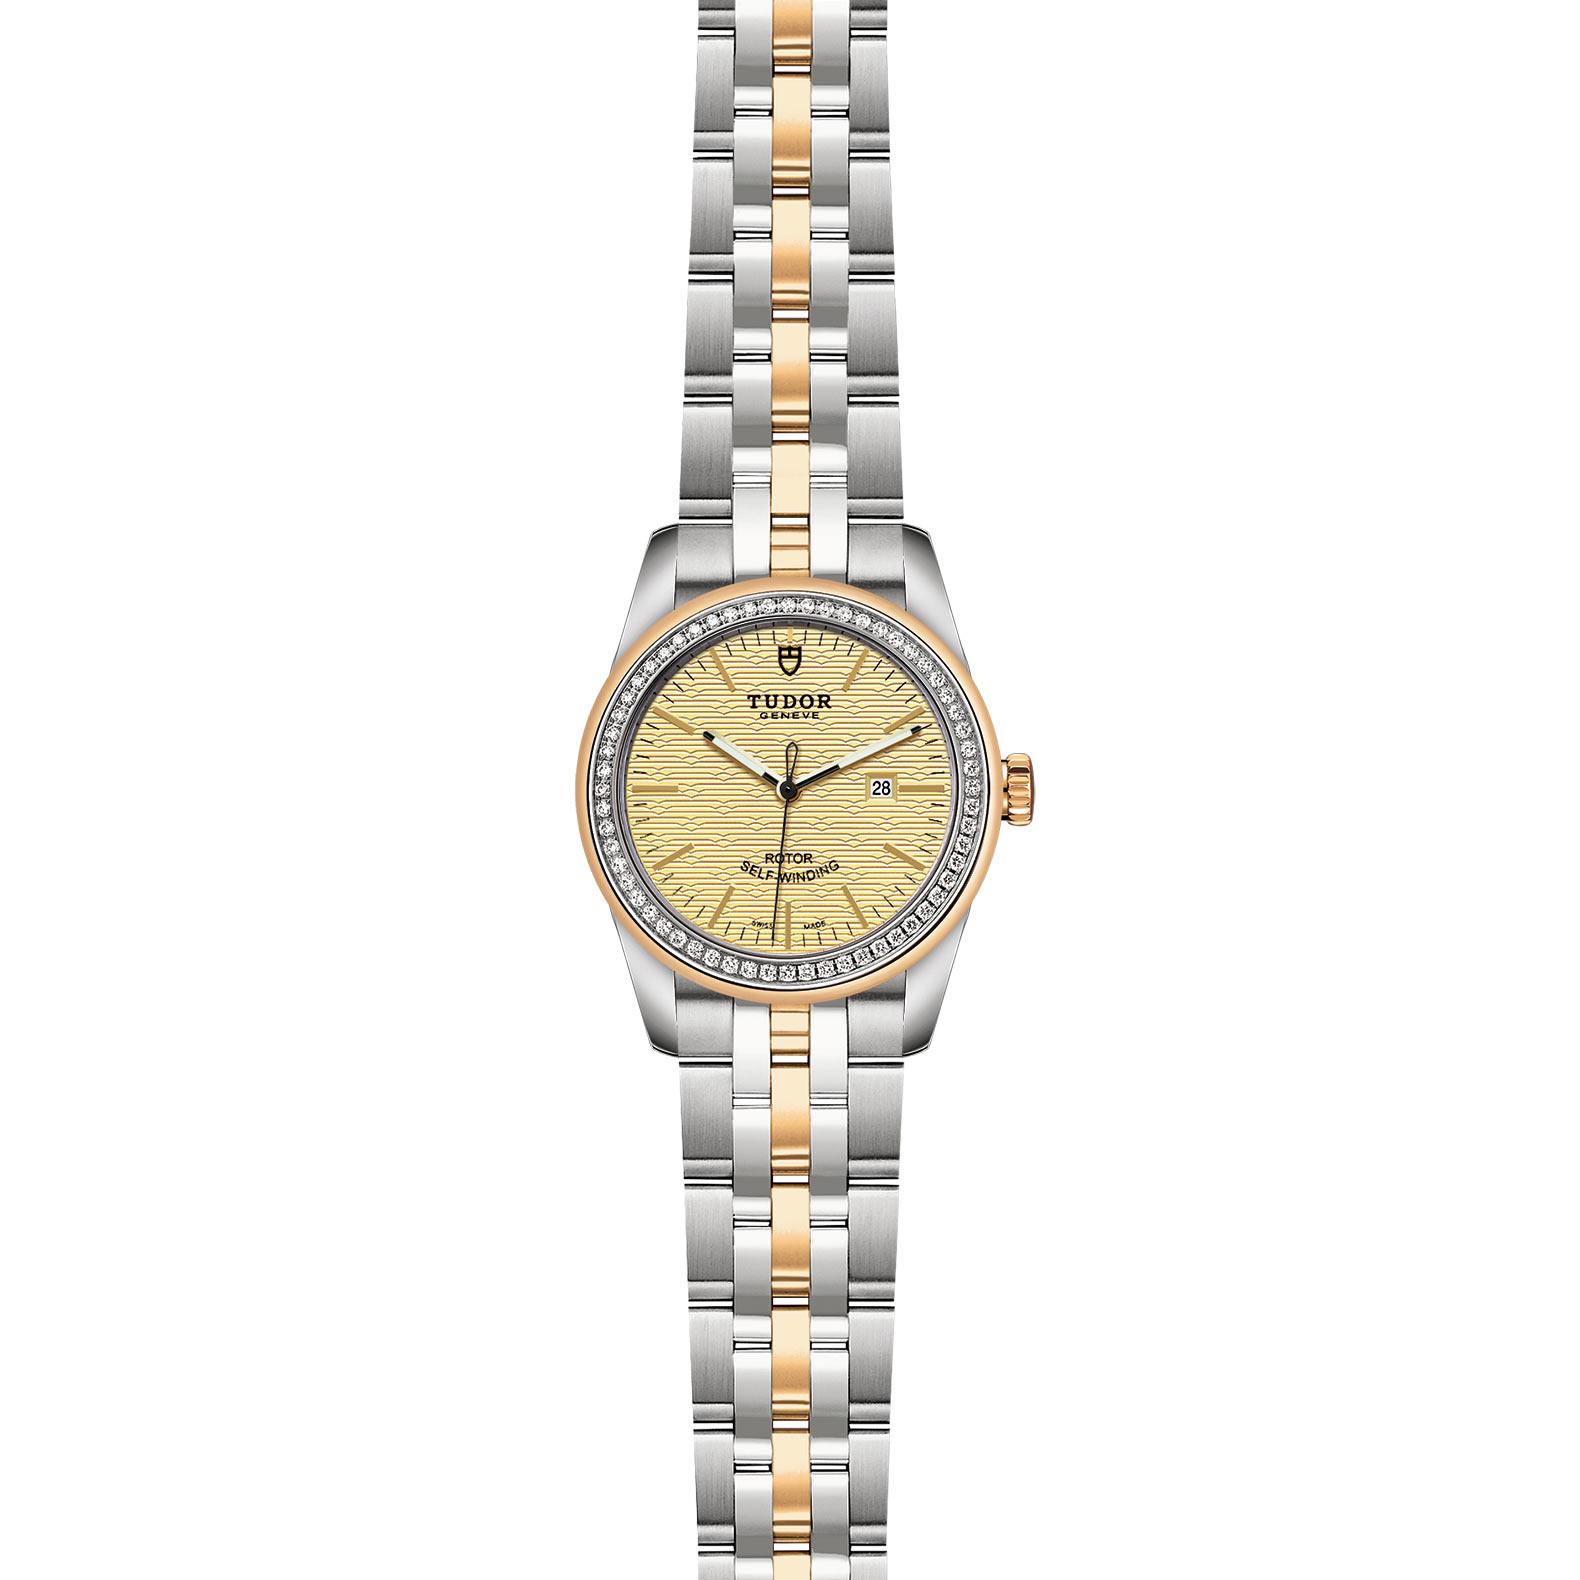 TUDOR Glamour Date M53023 0022 Frontfacing